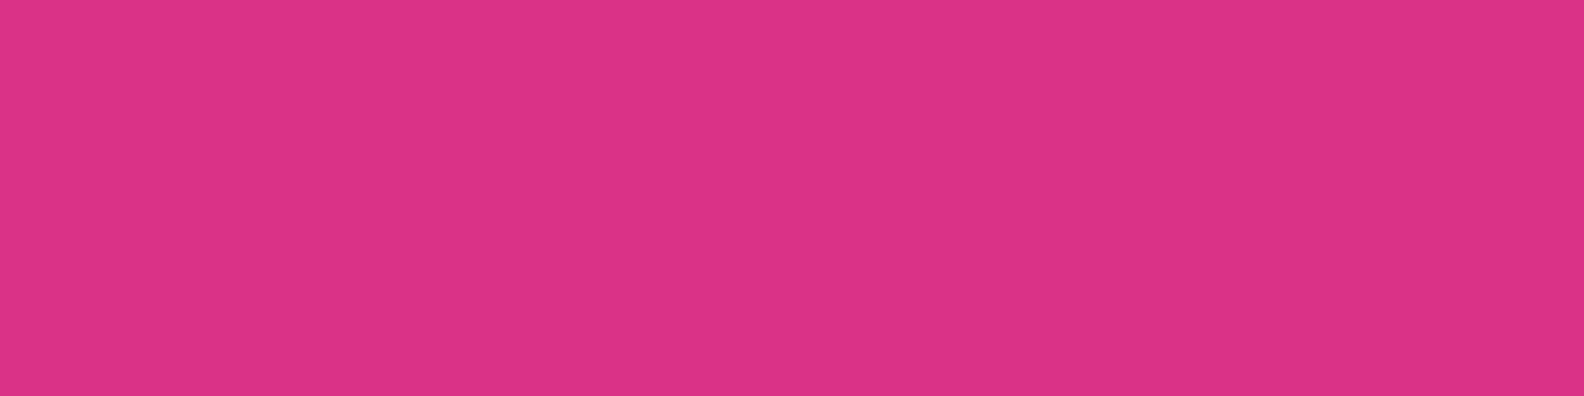 1584x396 Deep Cerise Solid Color Background